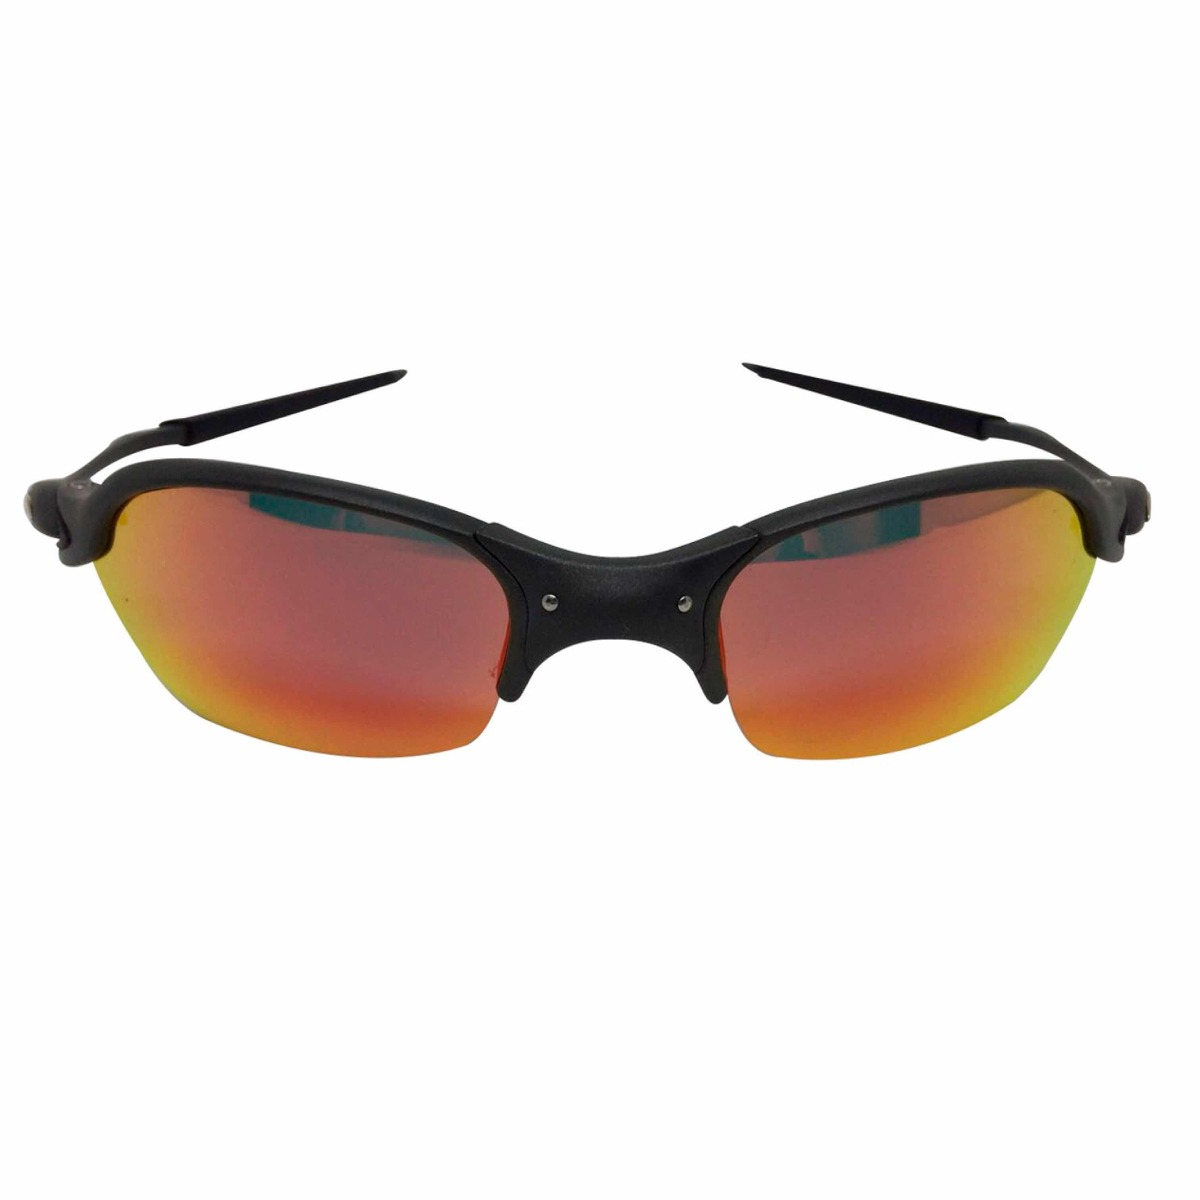 1c2655c54 oculos oakley juliet double x romeo 2 xmetal lente vermelha. Carregando  zoom.